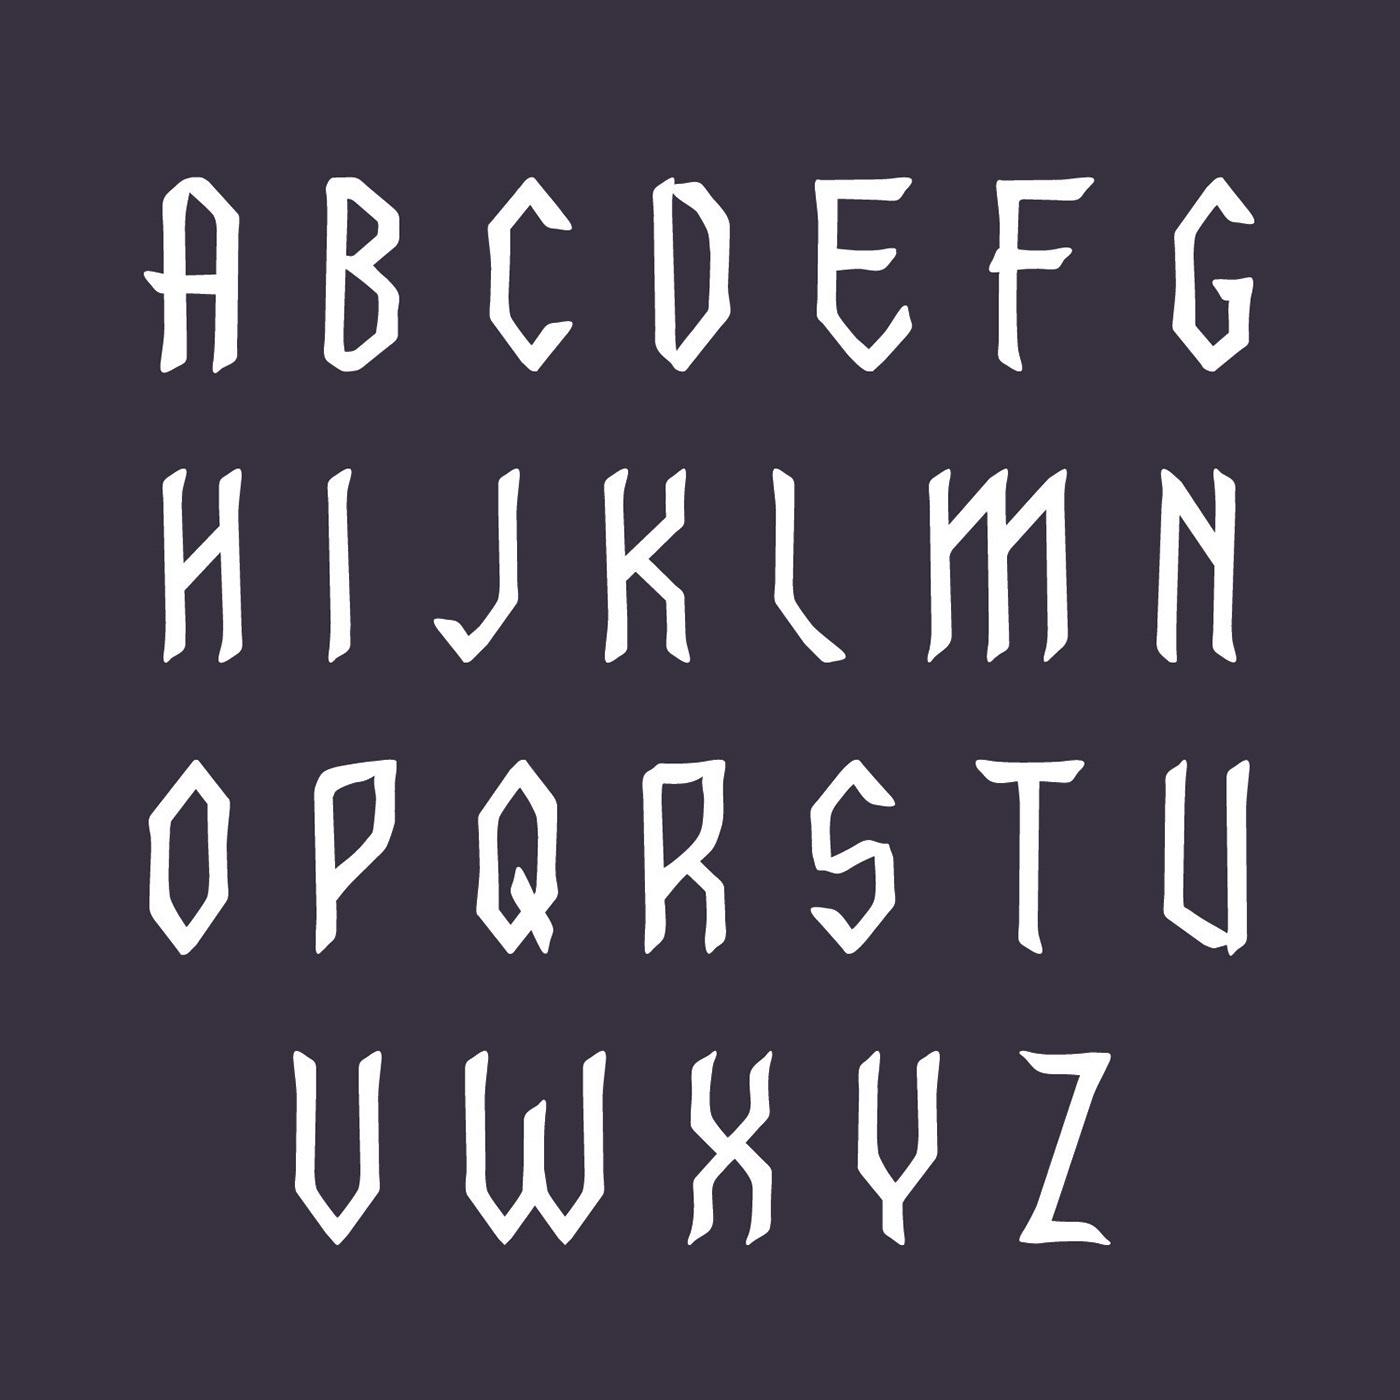 Fraktur free Free font free fonts freebies hand drawn rough traditional viking vintage